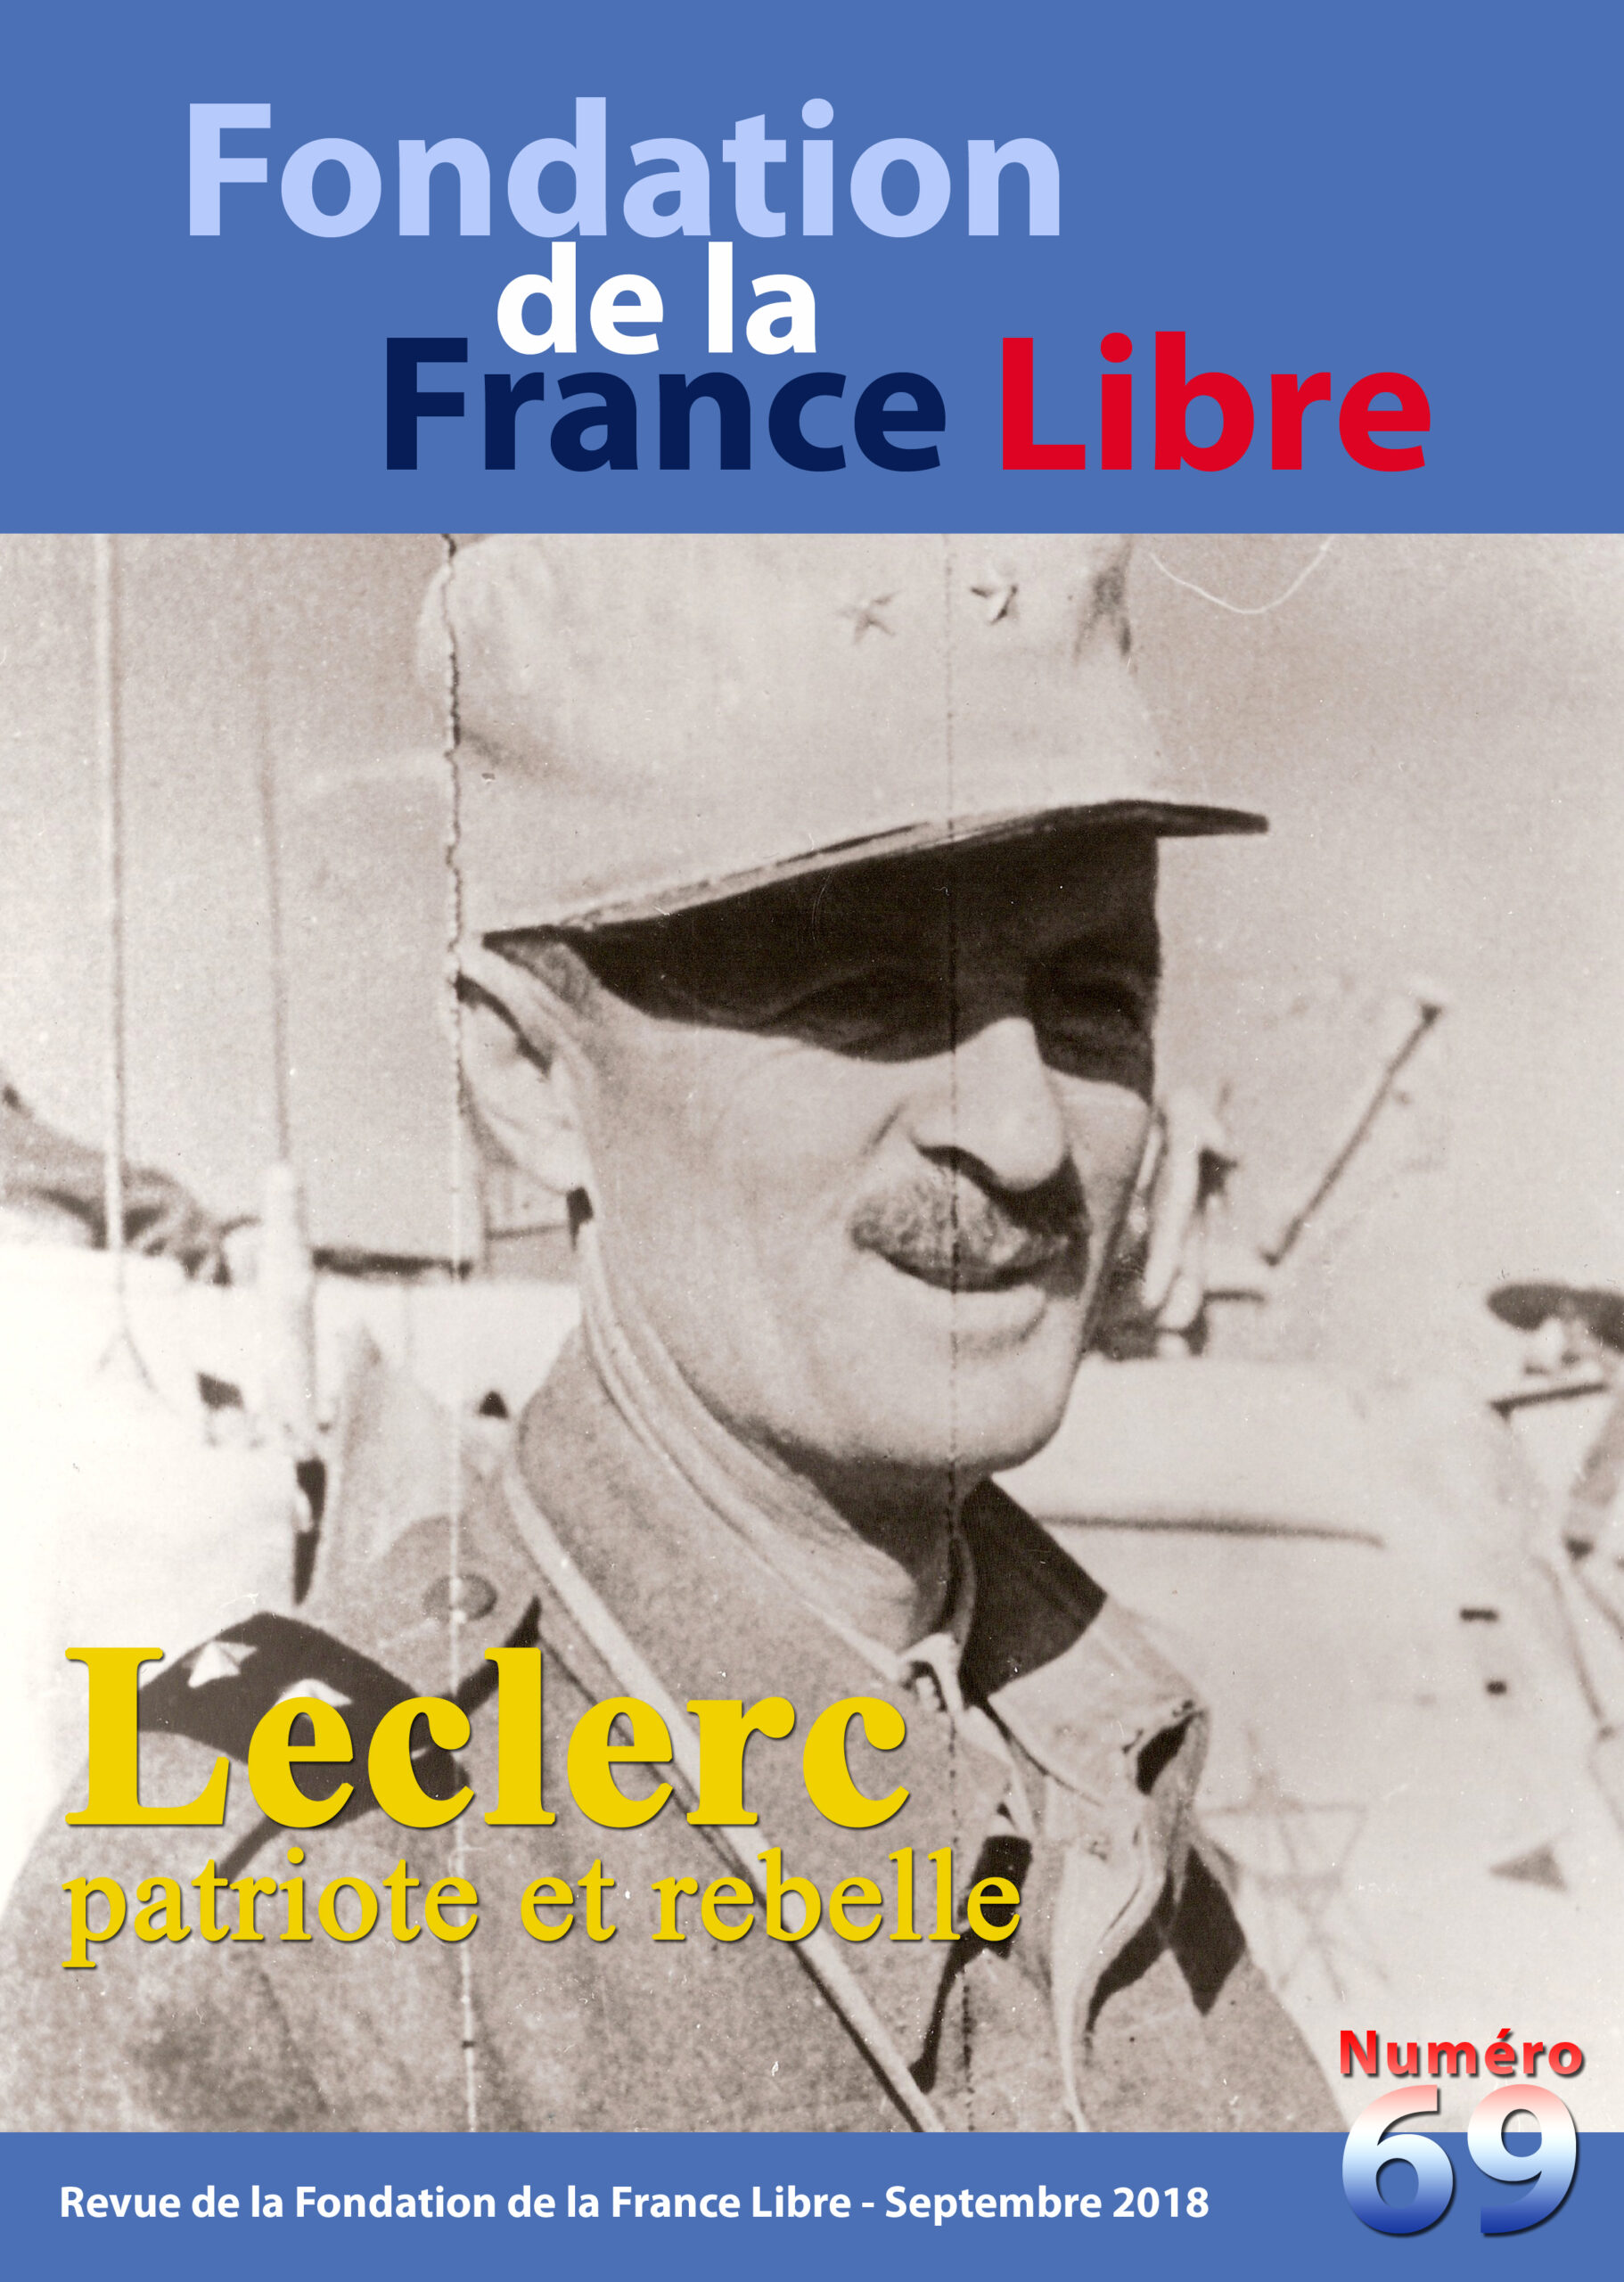 Fondation de la France Libre, n° 69, septembre 2018